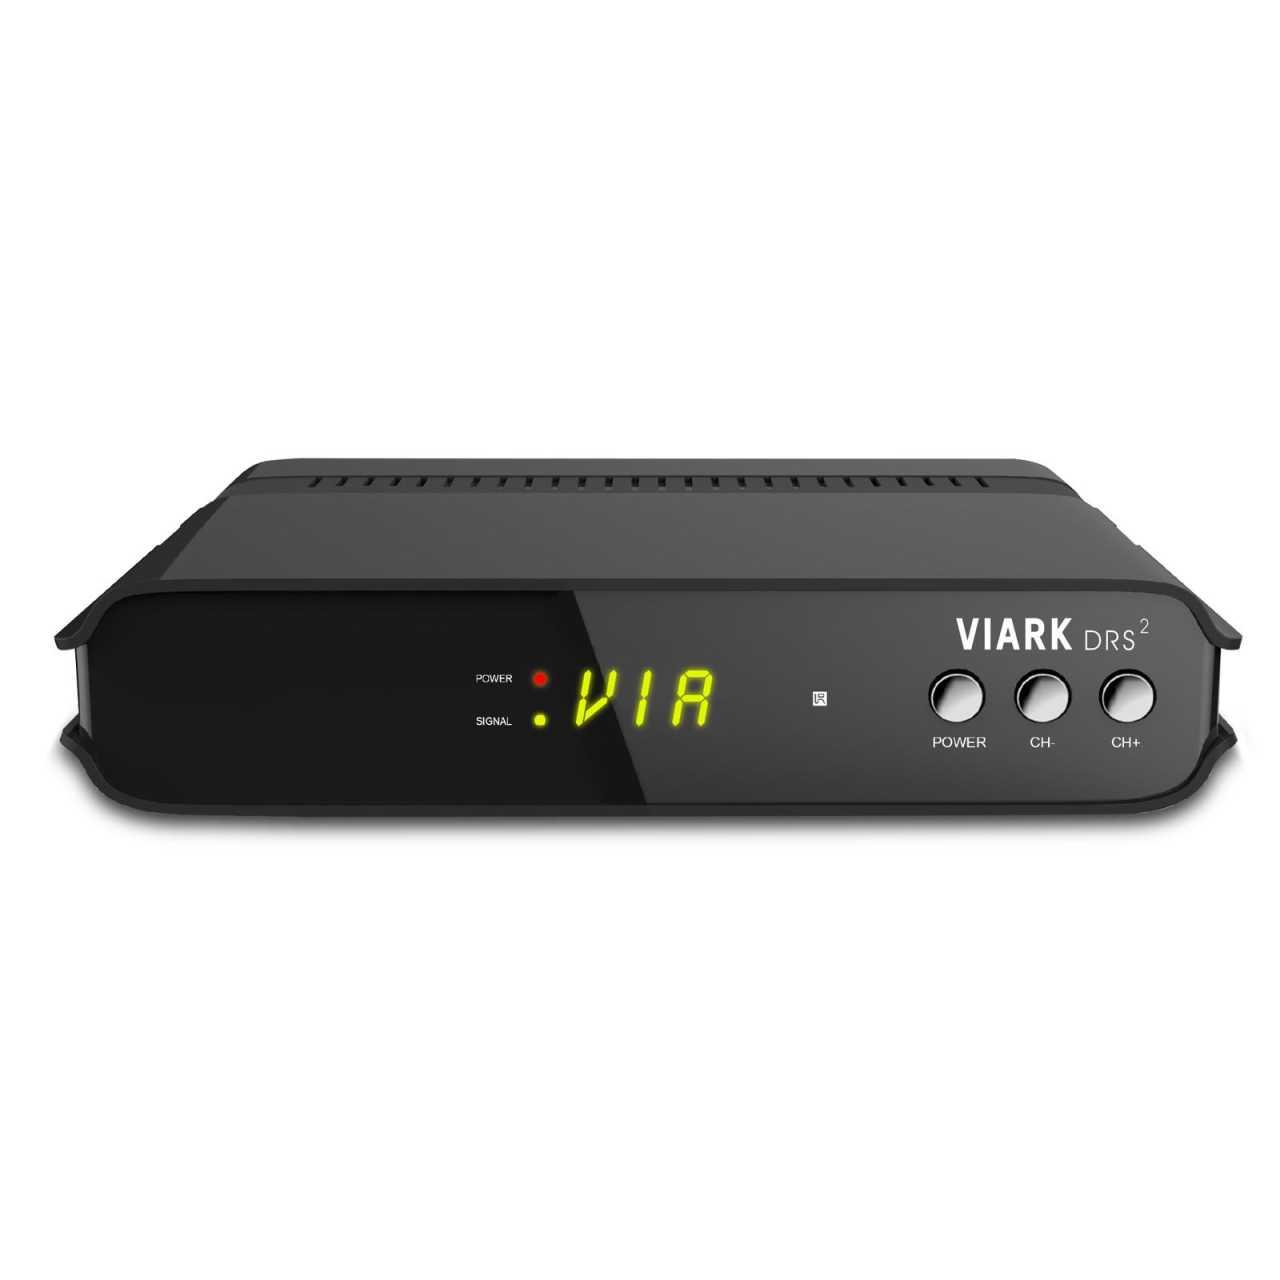 Viark DRS2 4K 2160p H.265 Android 7.0 Wifi DVB-S2 Multistream Sat Receiver Schwarz RECVIA007